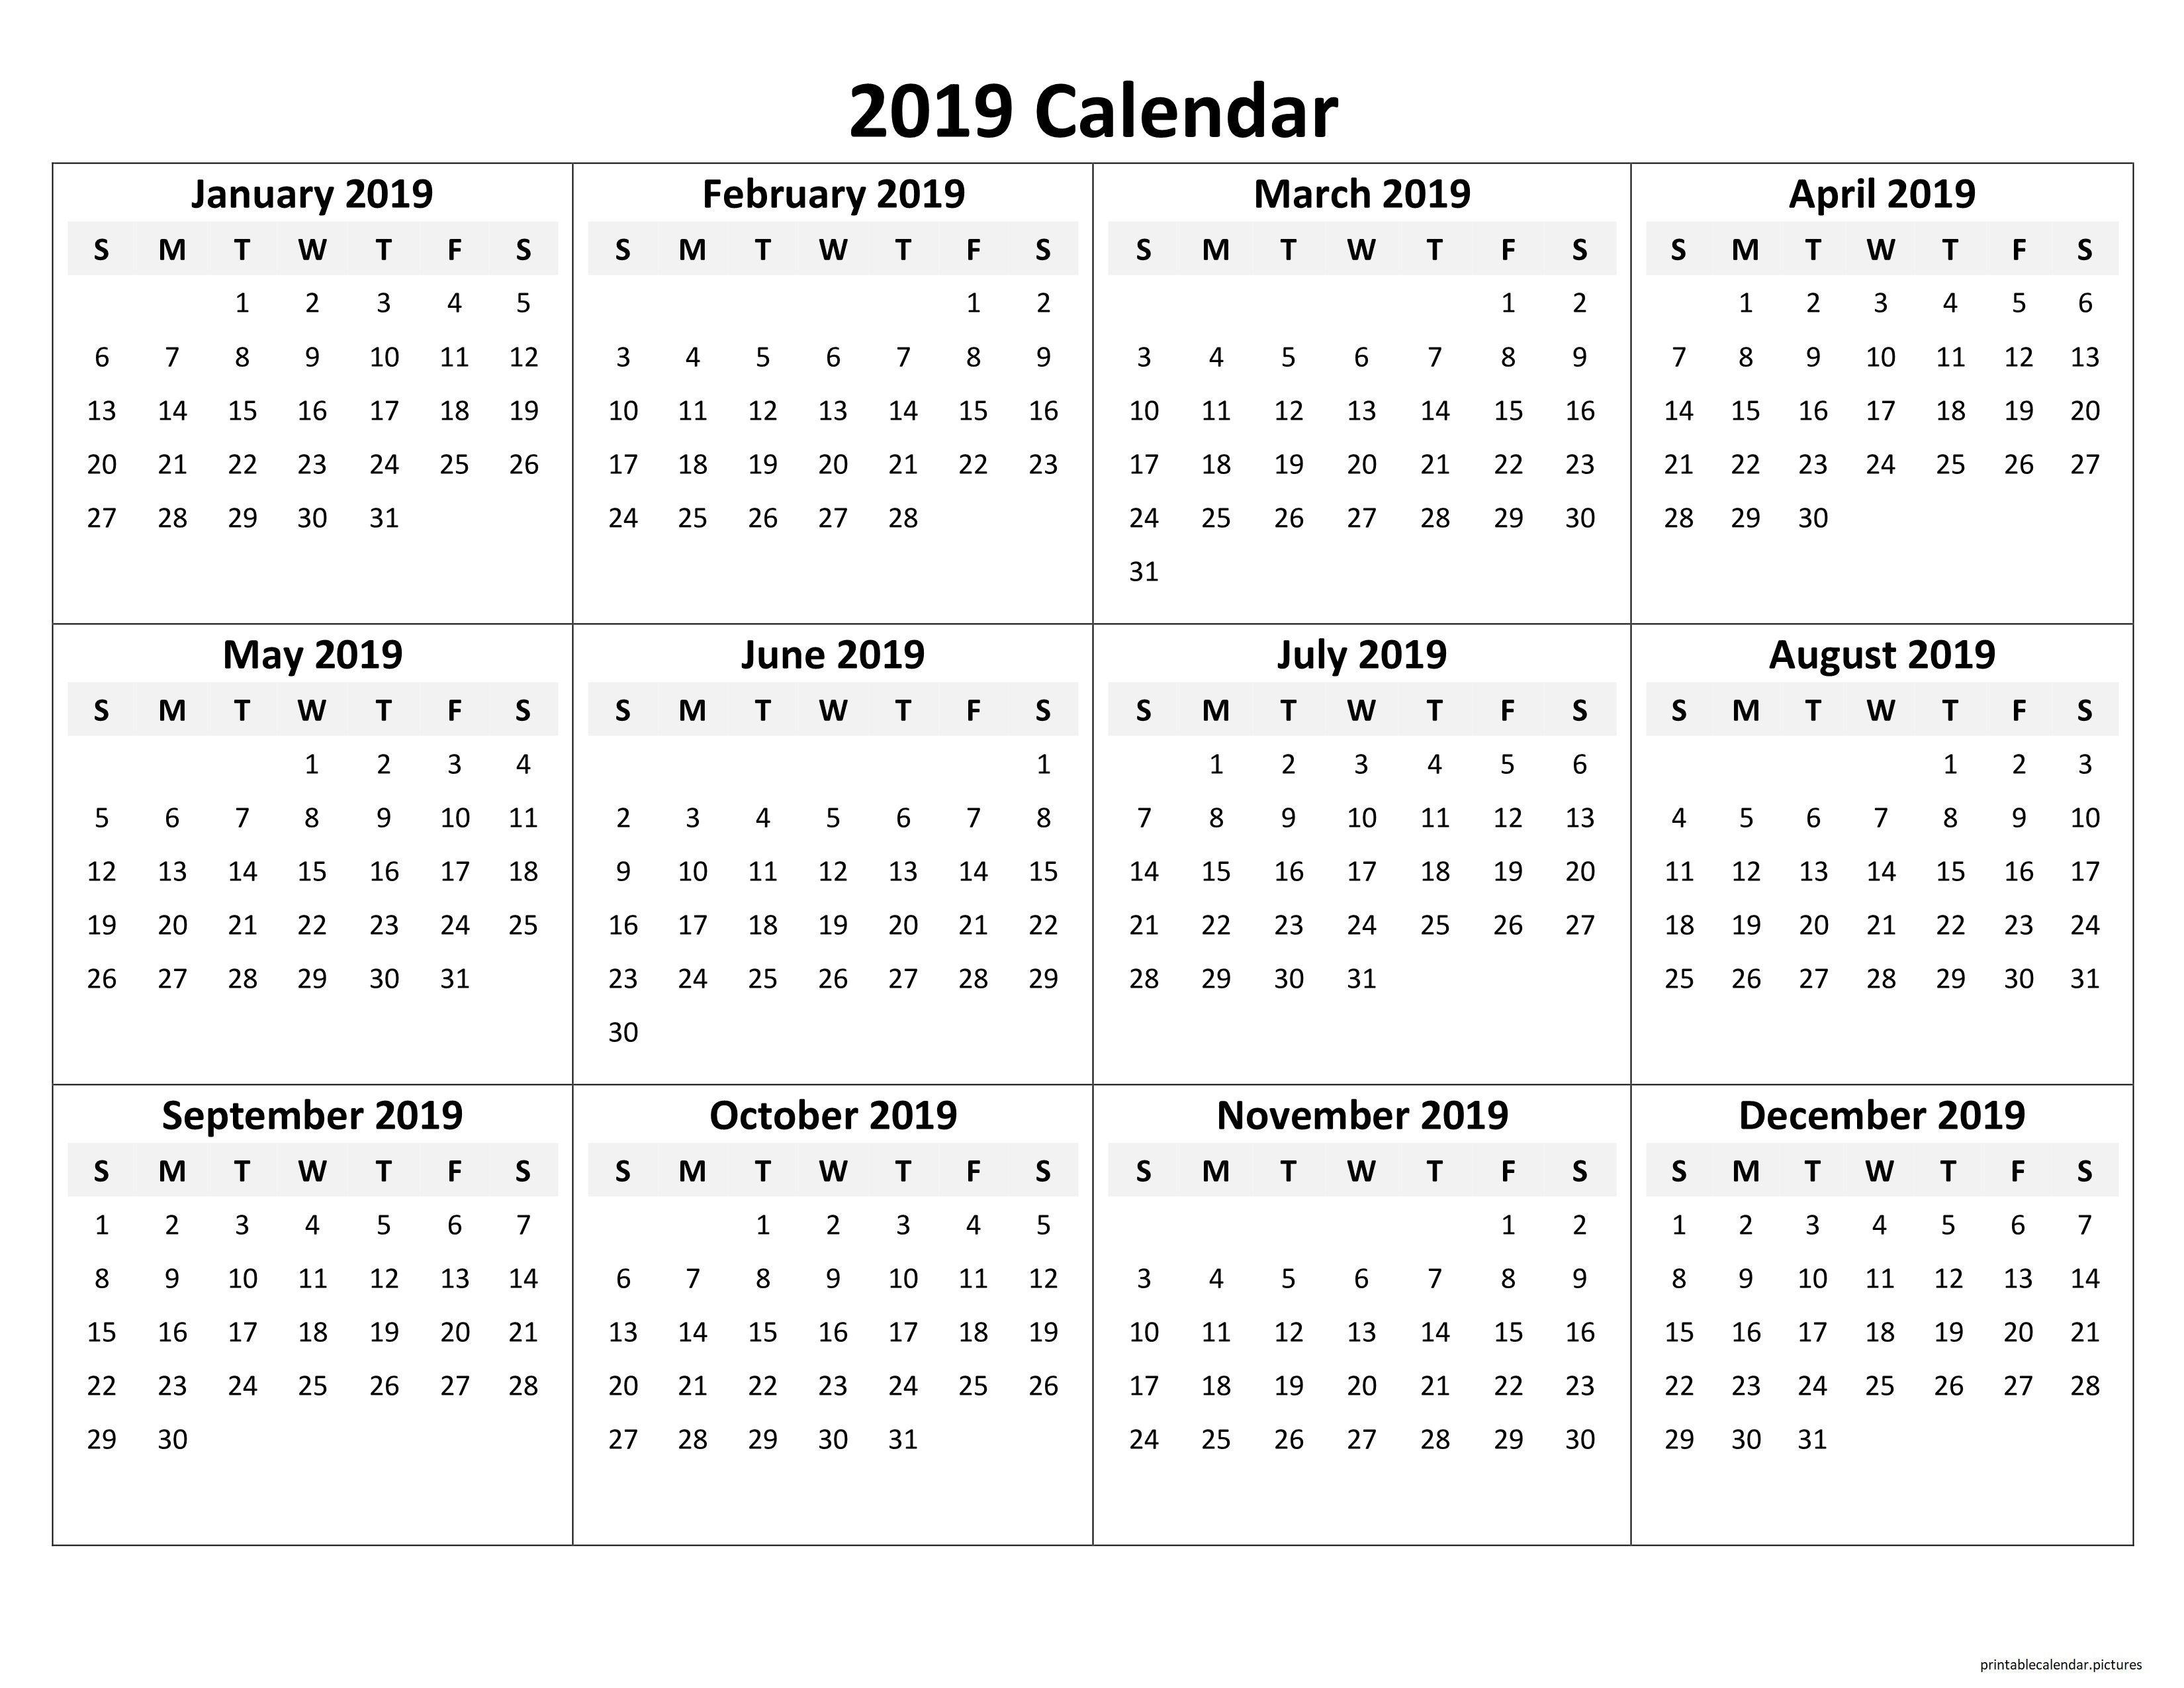 Printable Yearly Calendar 2019 | Printable Calendar 2019 | Blank Calendar 2019 Year Printable